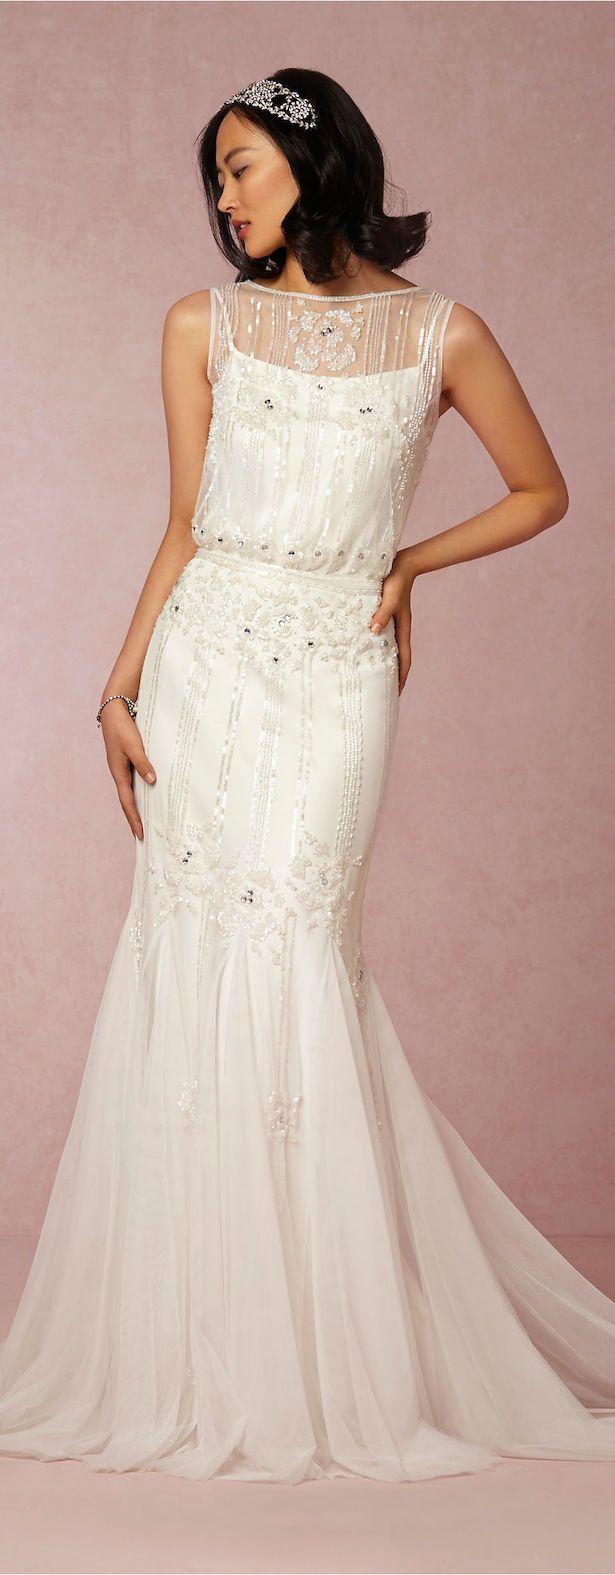 Best 25 Bhldn Wedding Dresses Ideas On Pinterest